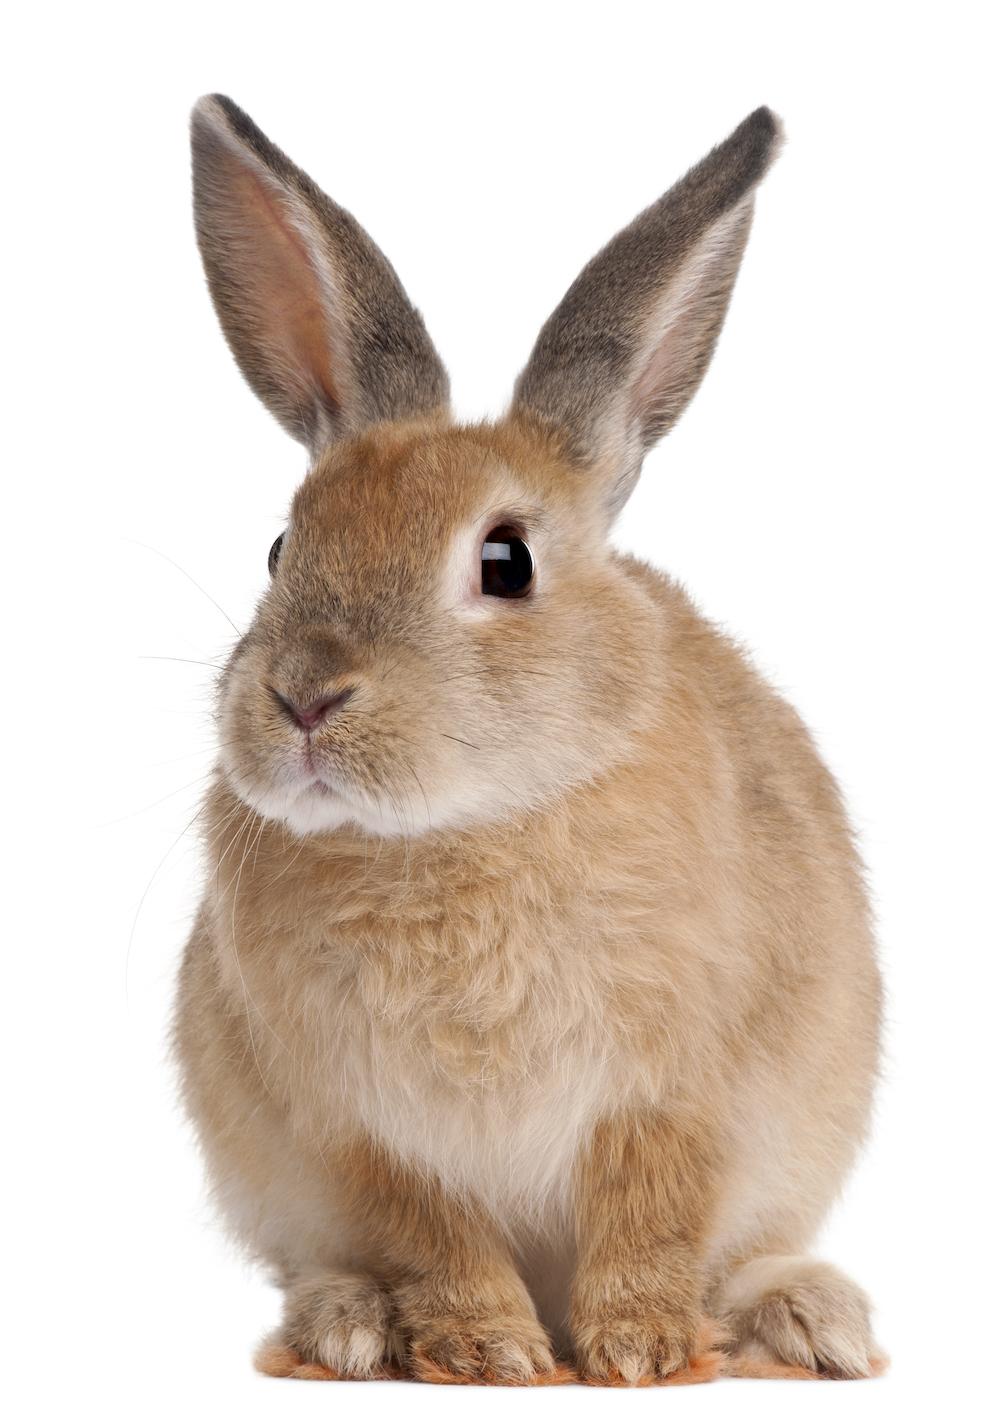 Morning Links: $91.1 M. Rabbit Edition